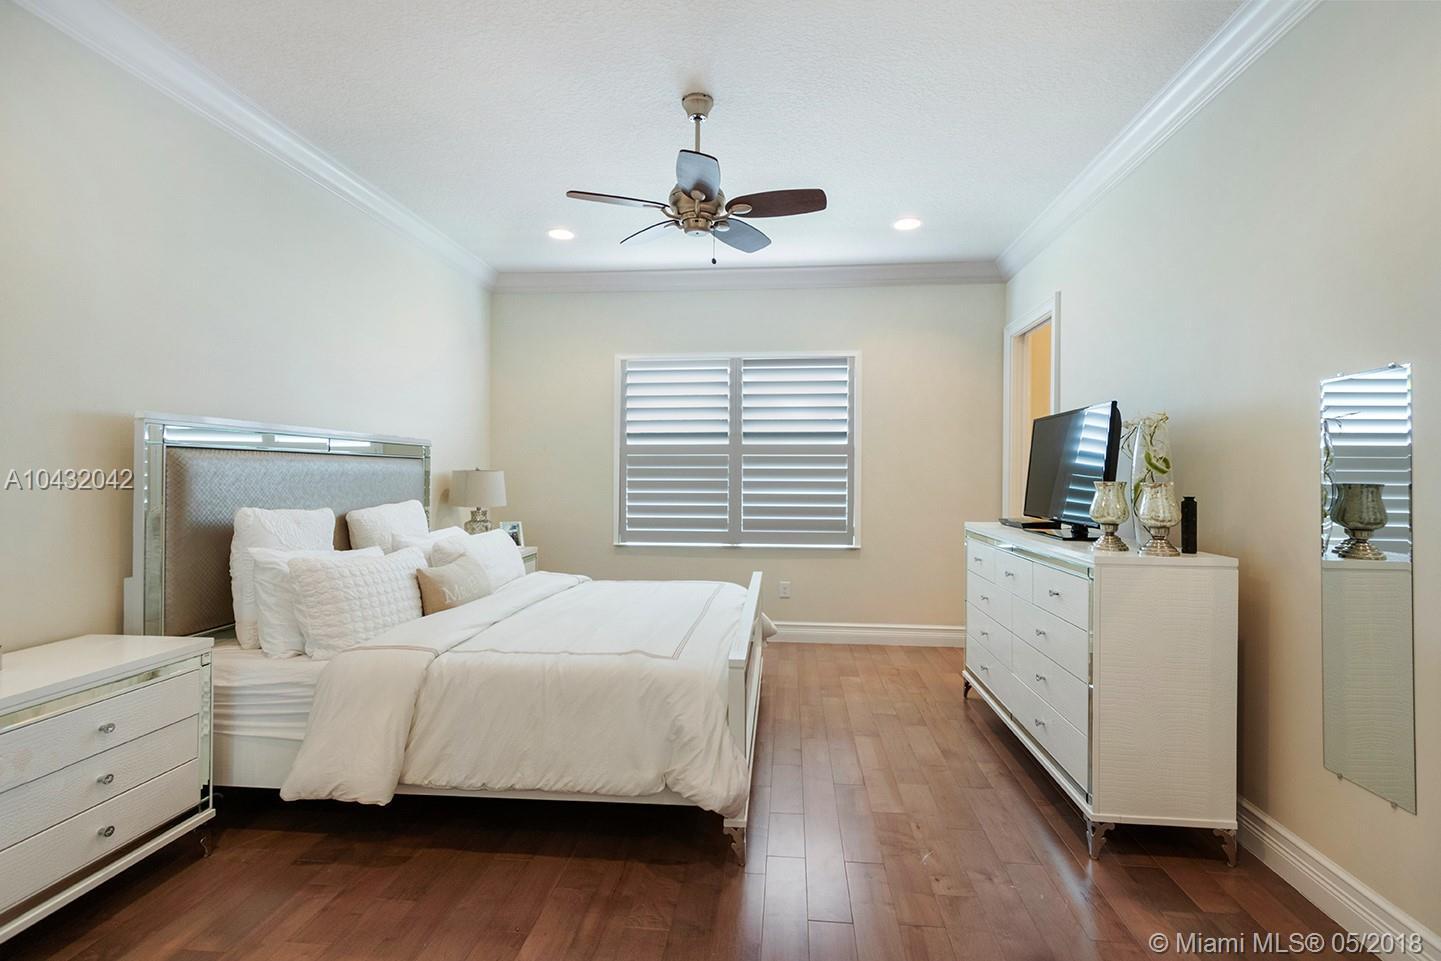 8510 Hawks Gully Ave, Delray Beach FL, 33446